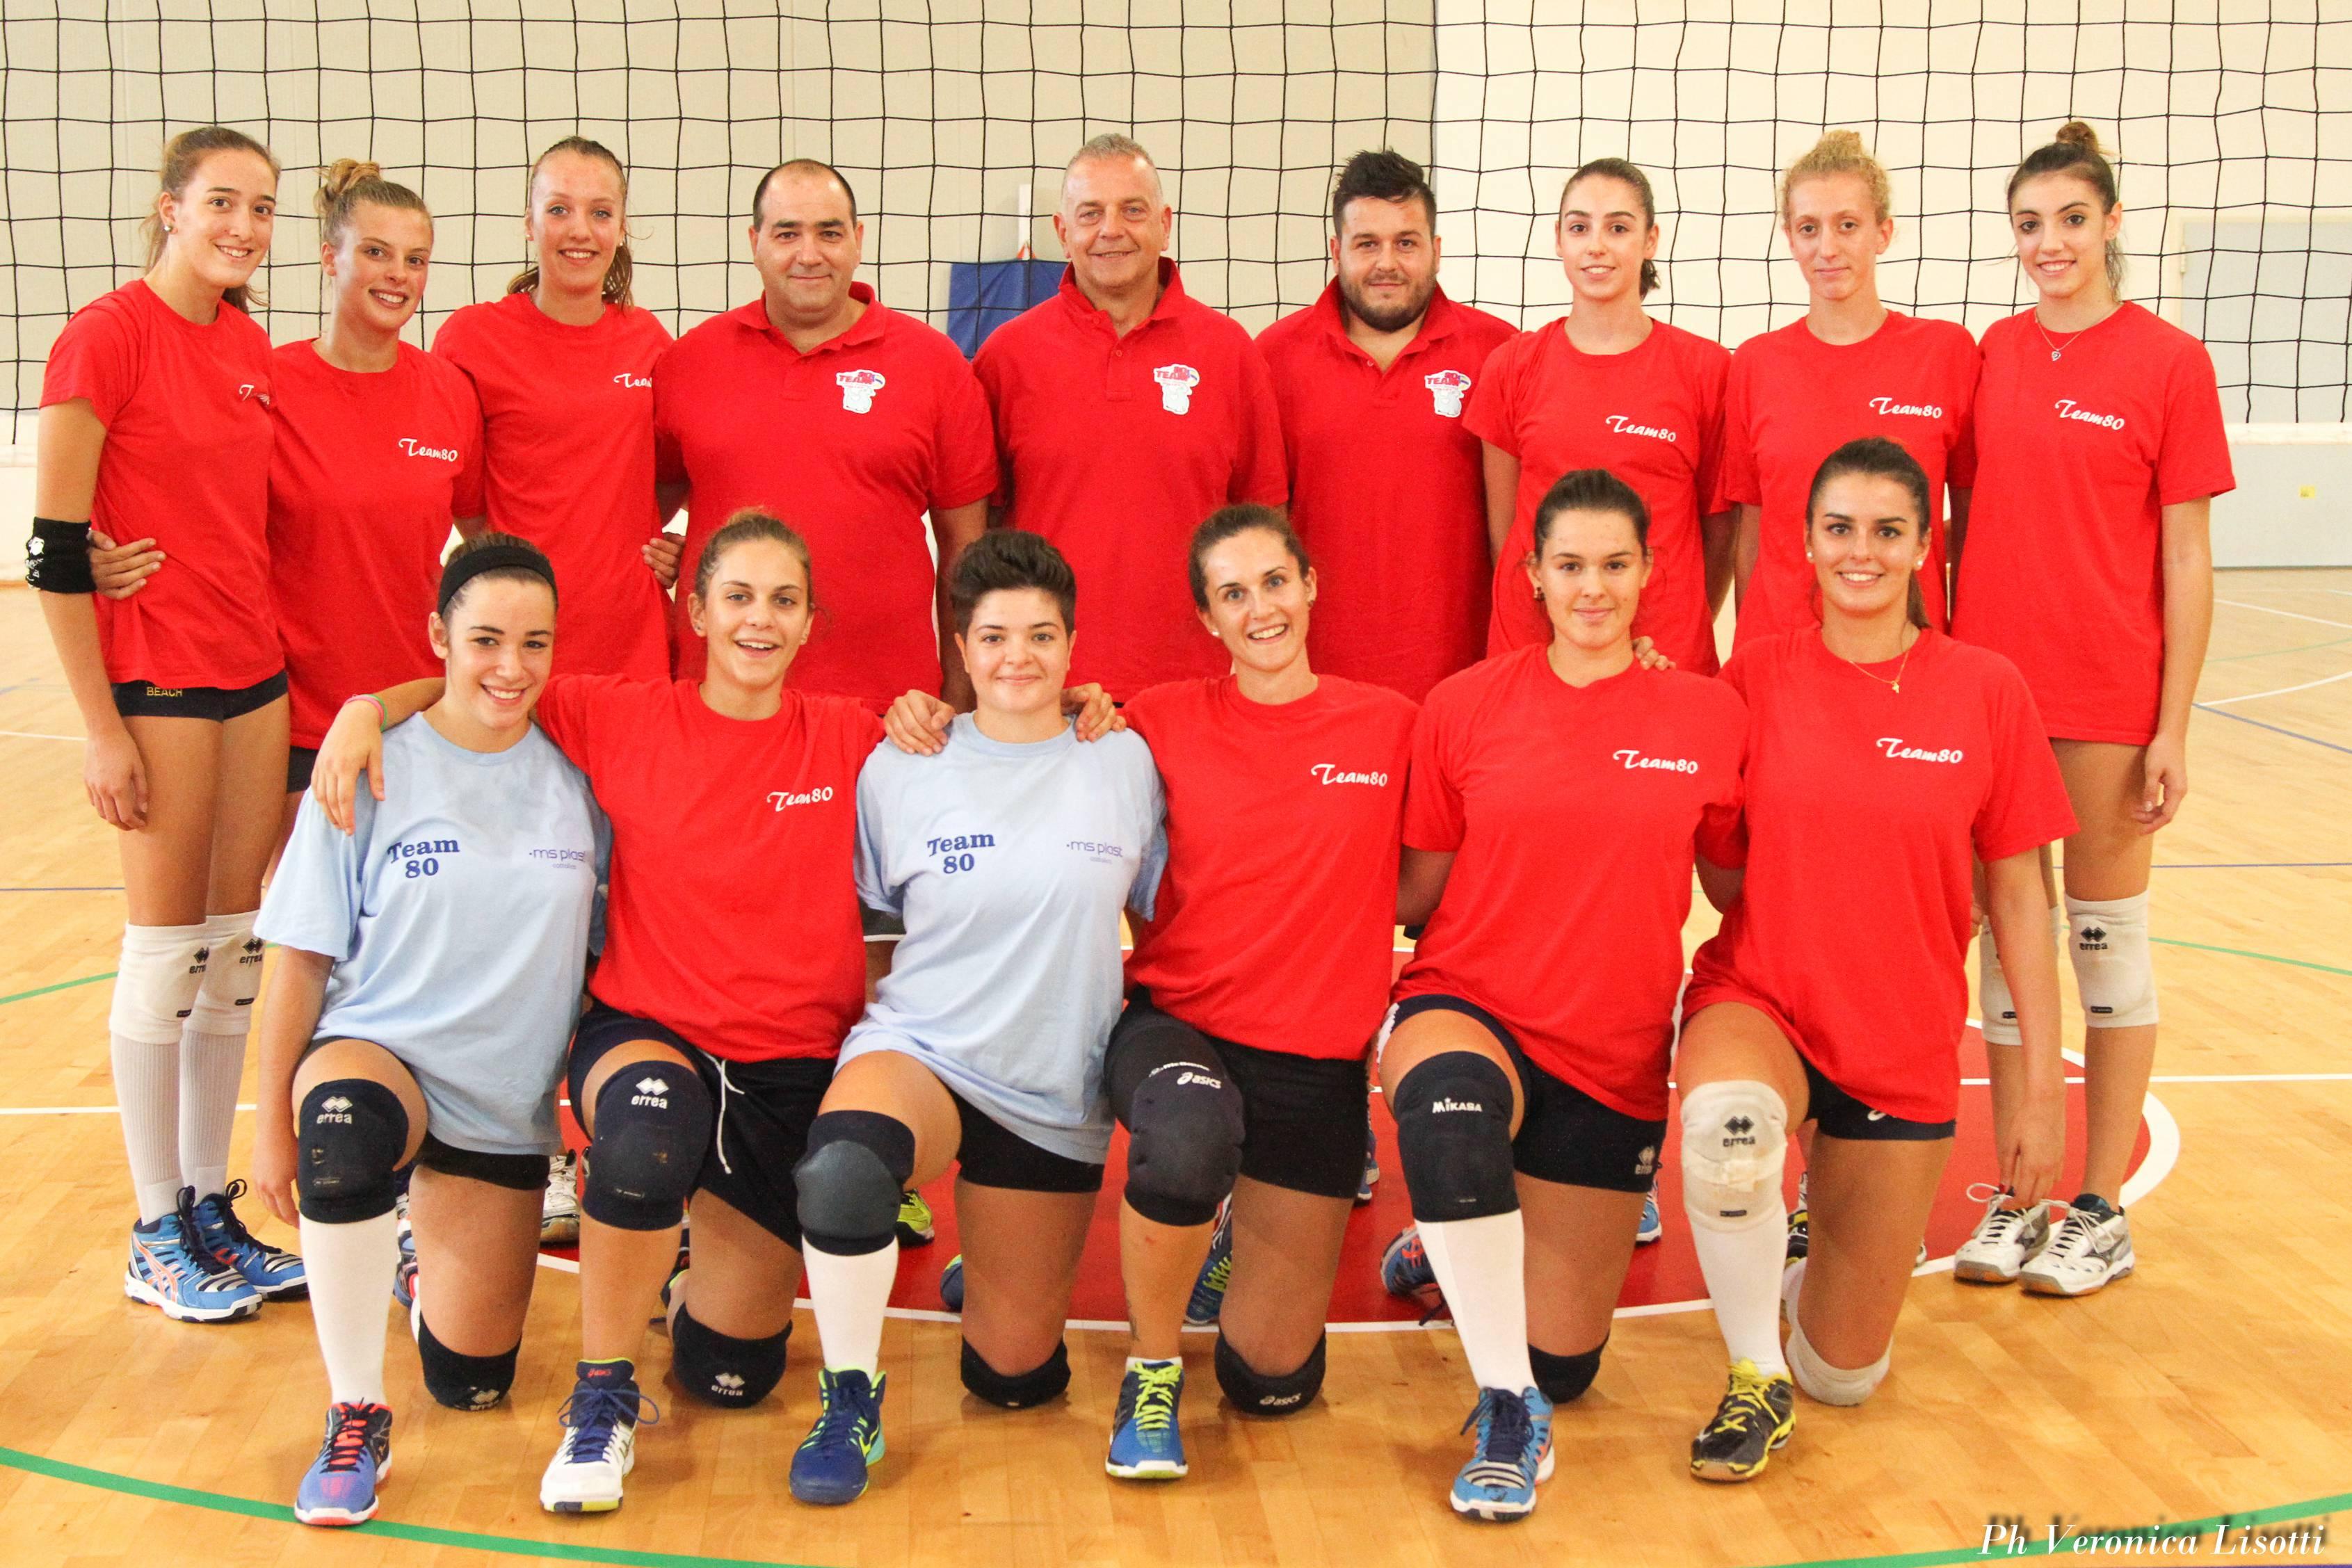 Imola Volley-Team 80